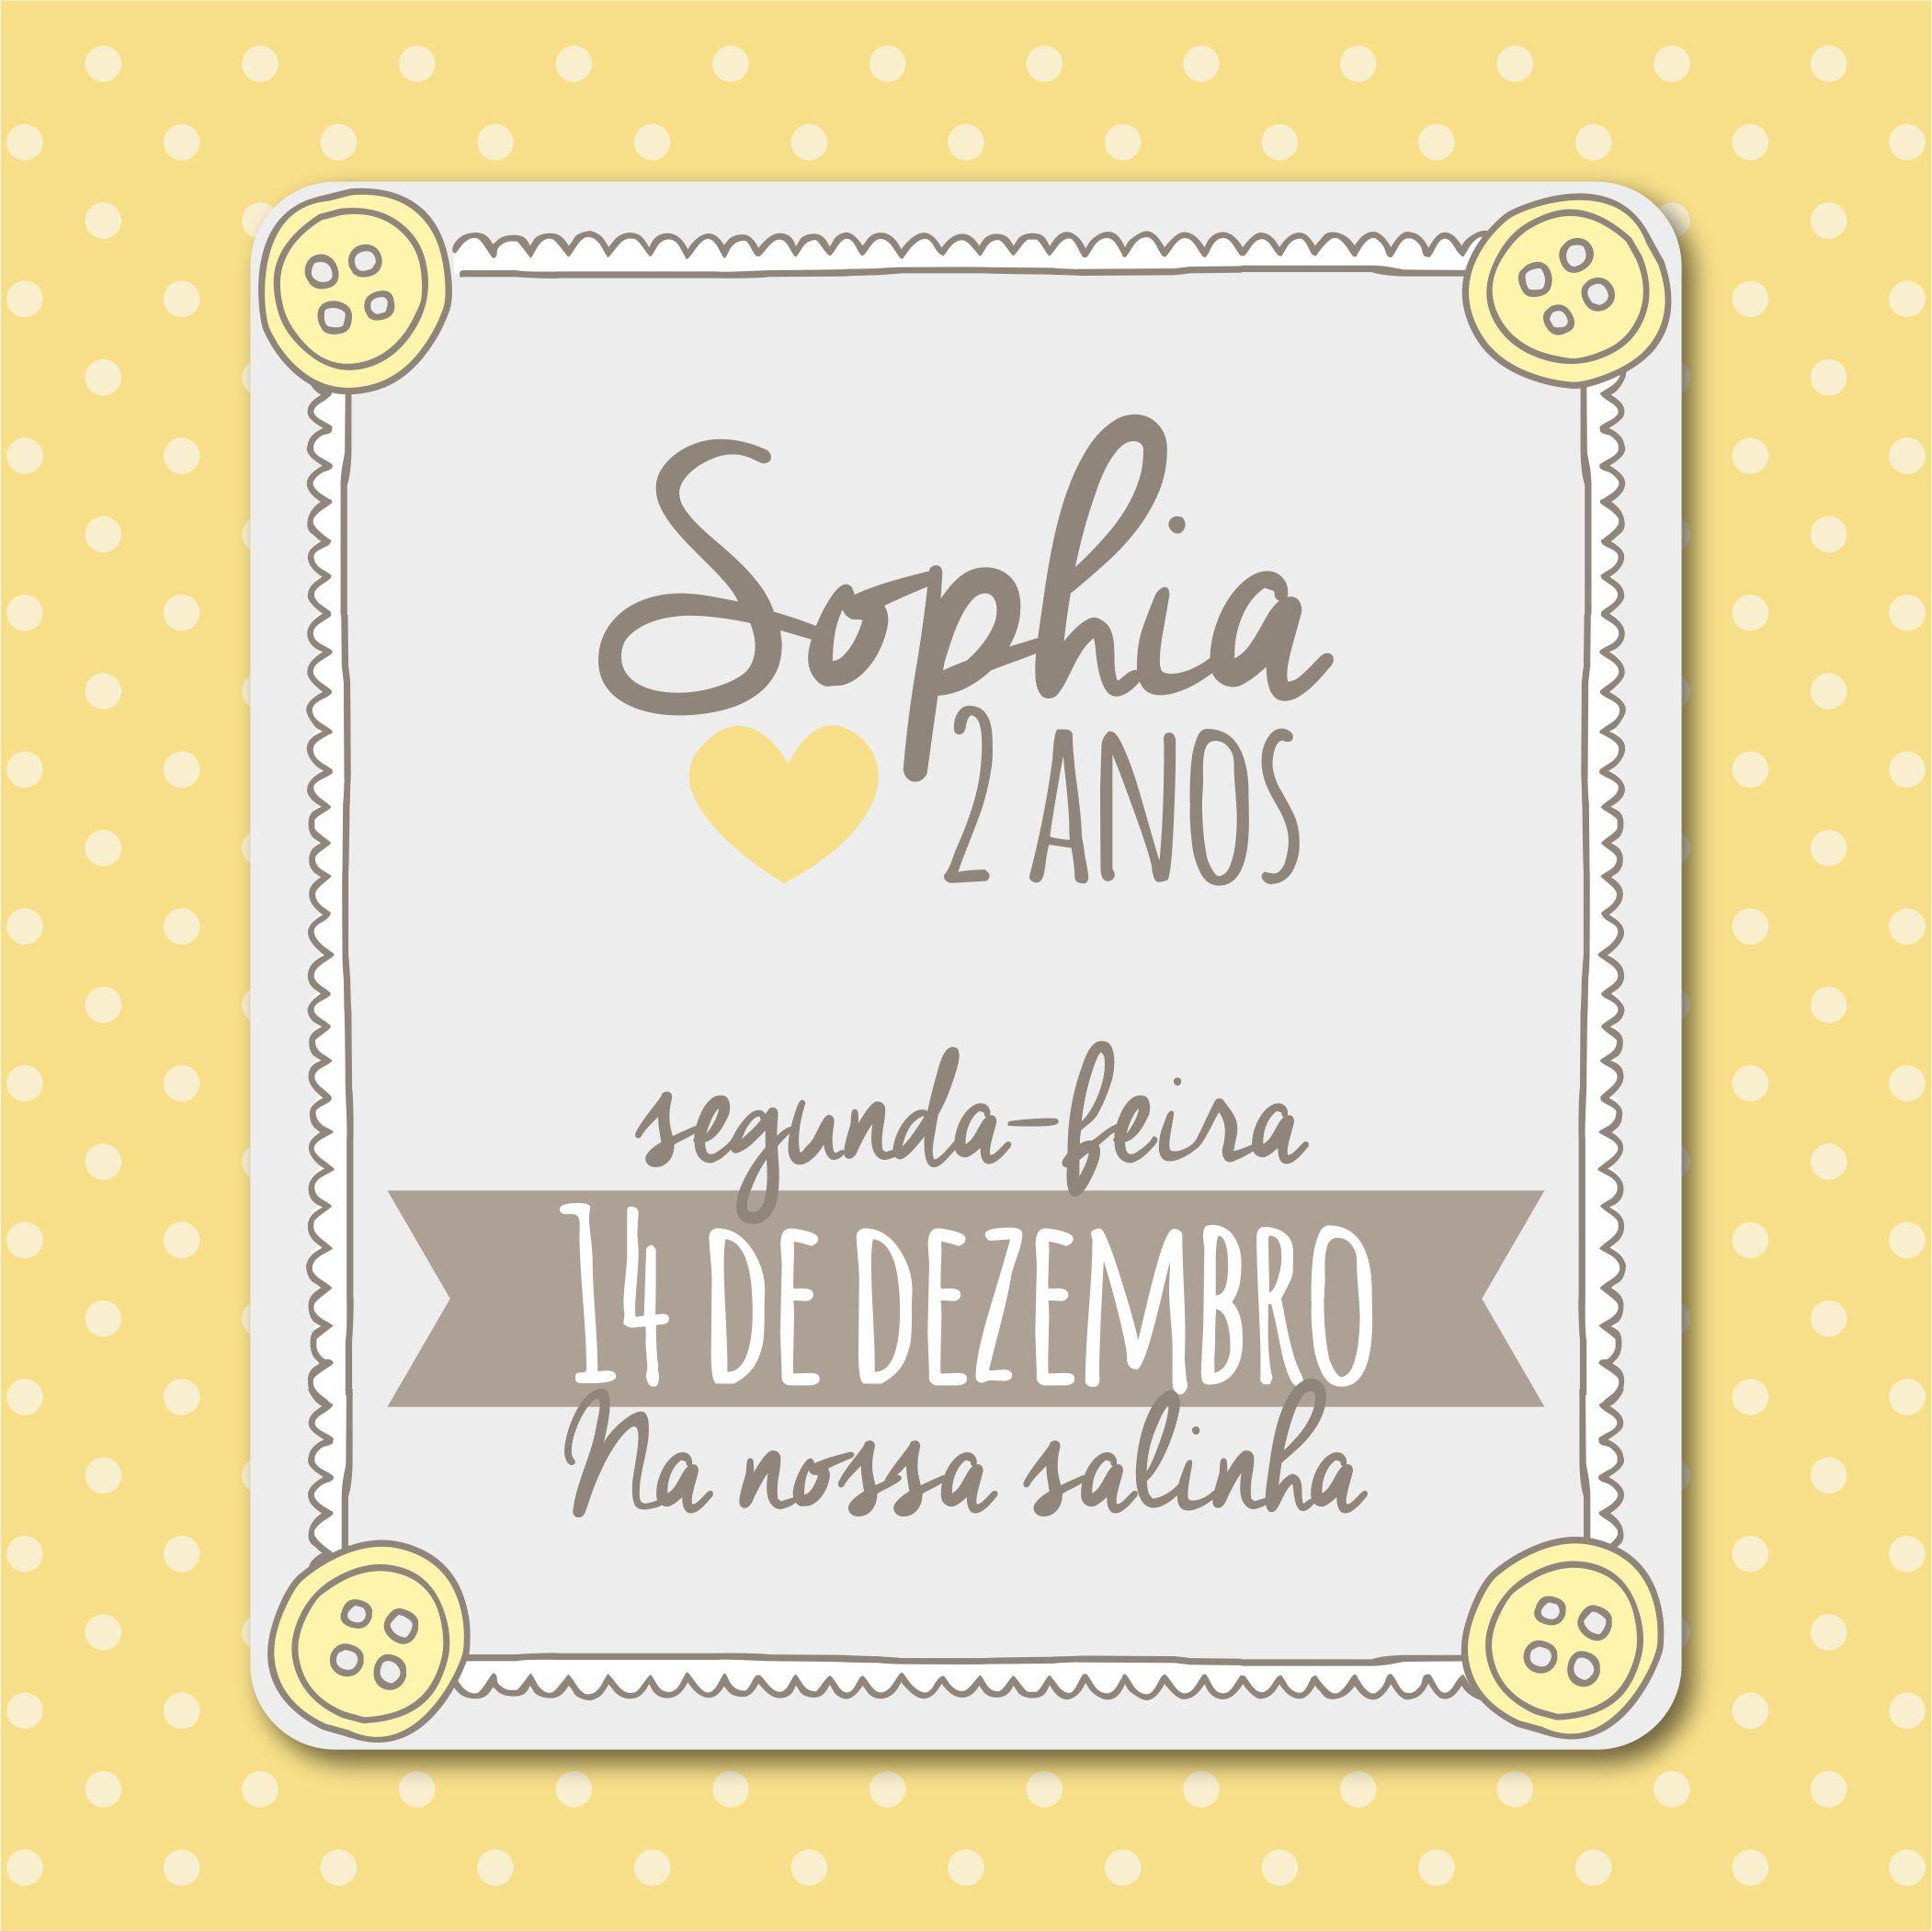 Sophia 2 anos_escola_convite.jpg